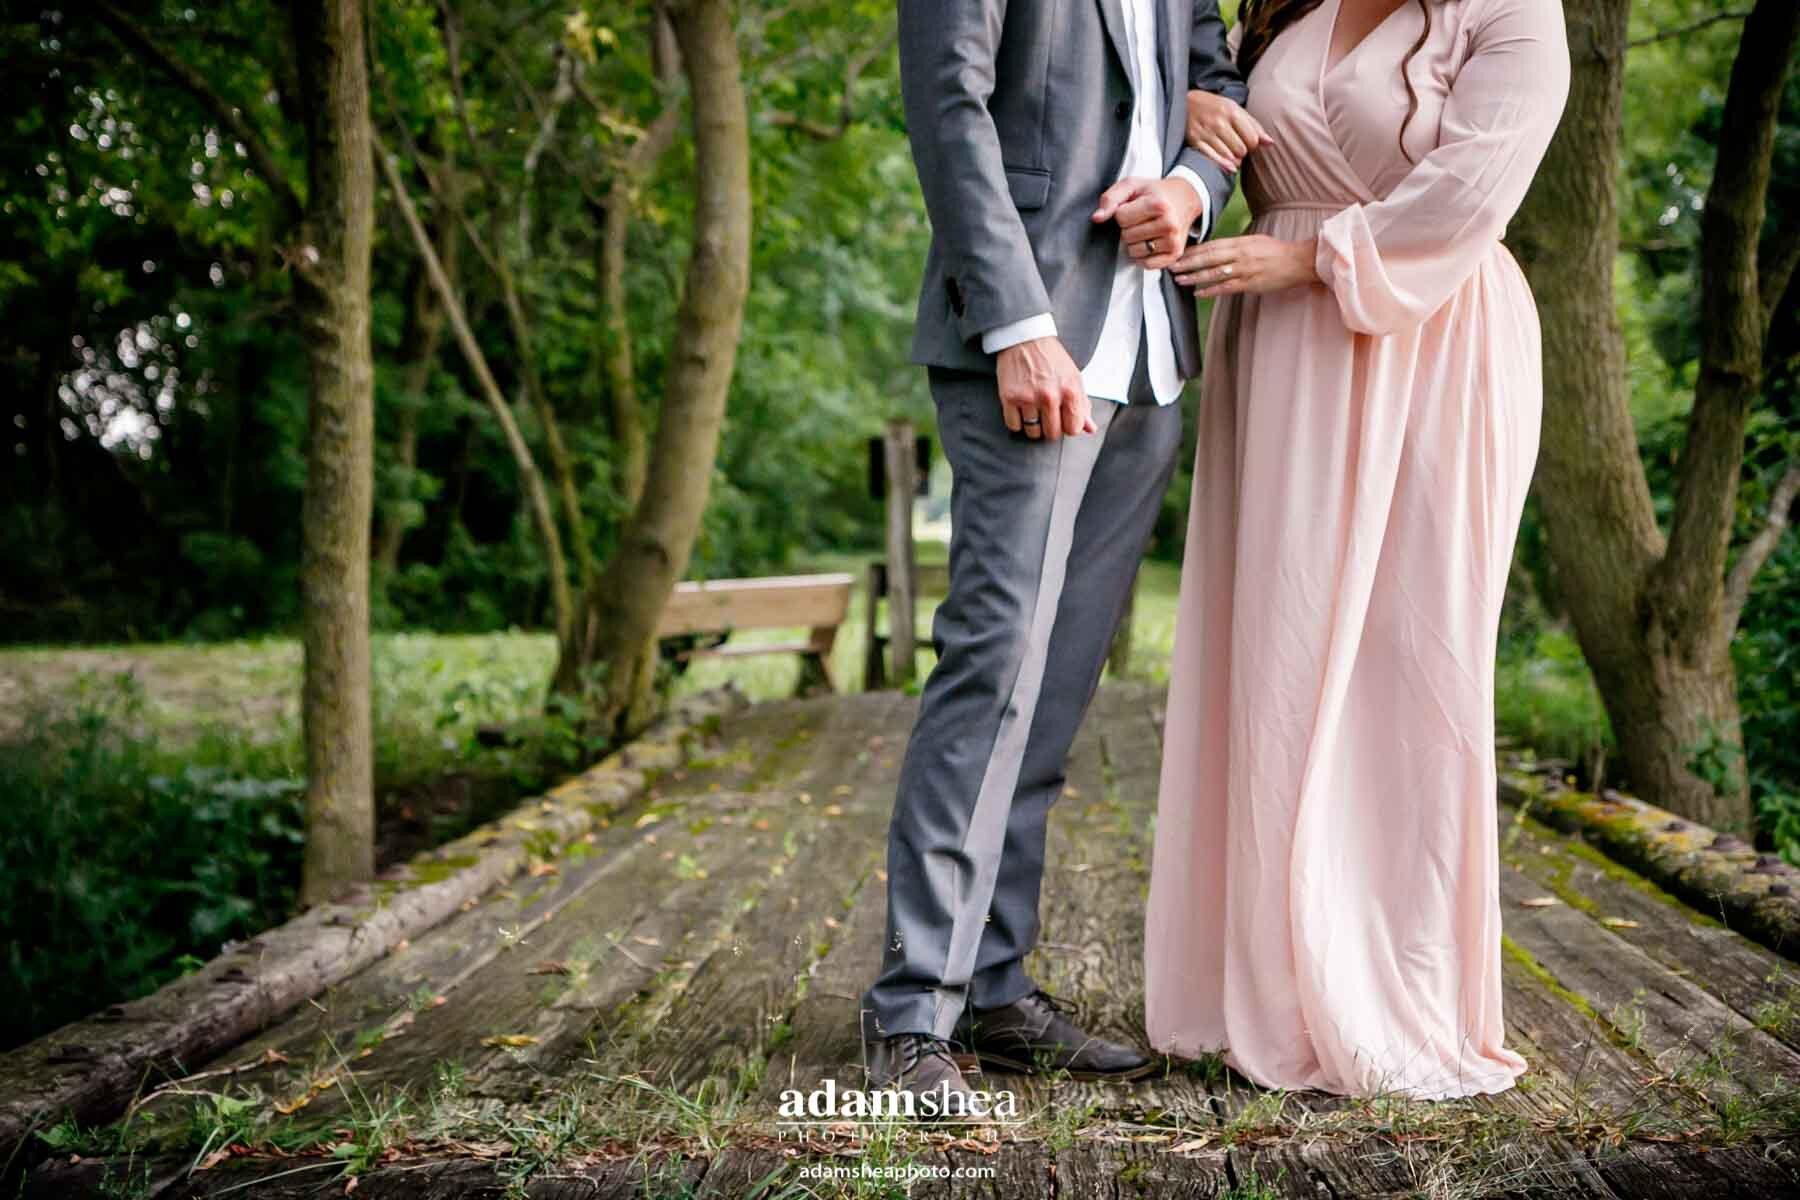 amy-adam-engagement-photos-larsen-wi-neenah-winding-trail-flowy-dress-grey-suit-adam-shea-photography-green-bay-appleton-neenah-photographer-11.jpg